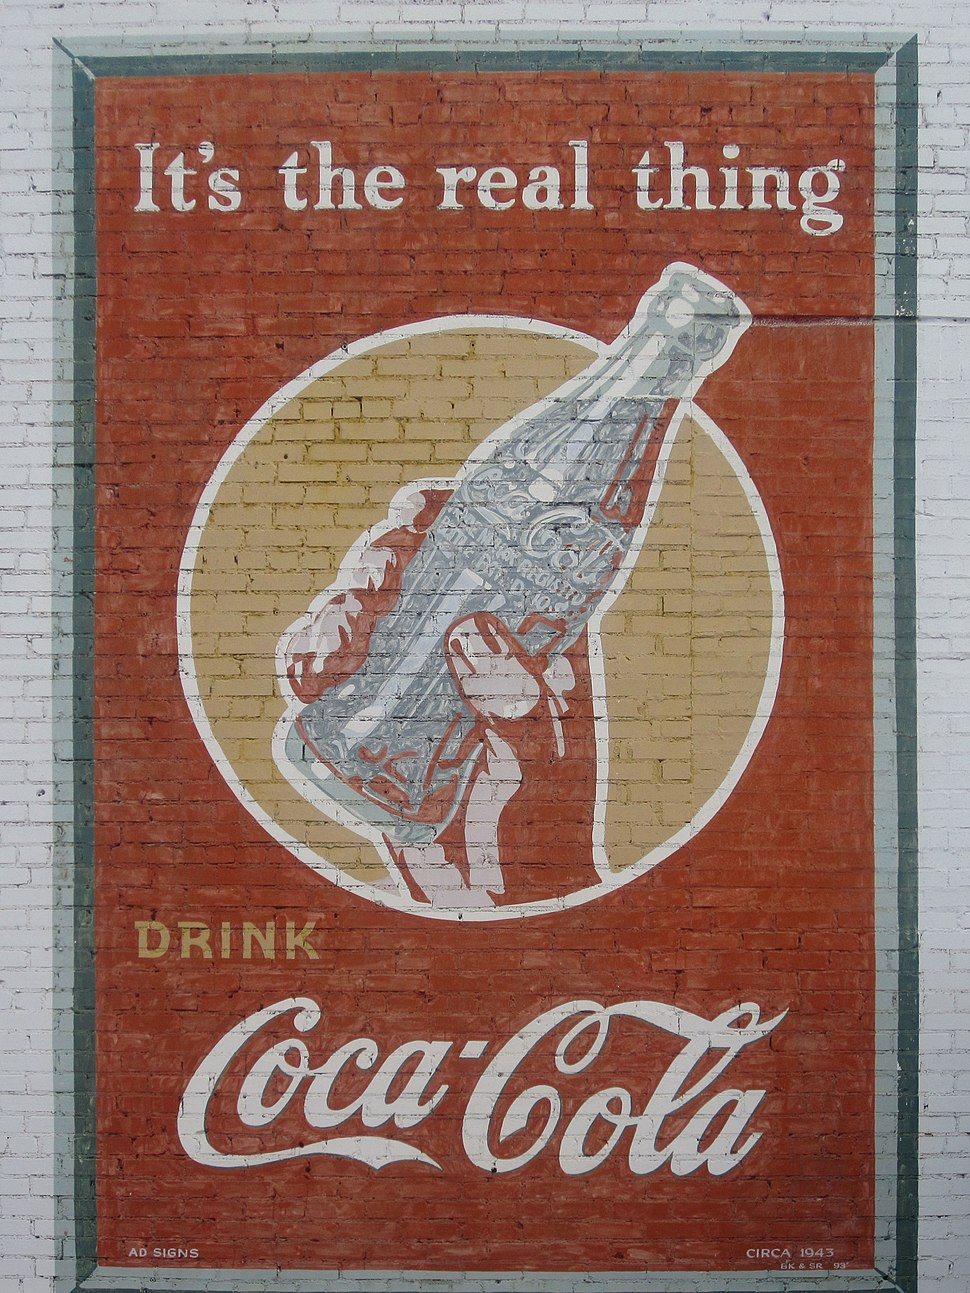 Coca Cola ad ca. 1943 IMG 3744